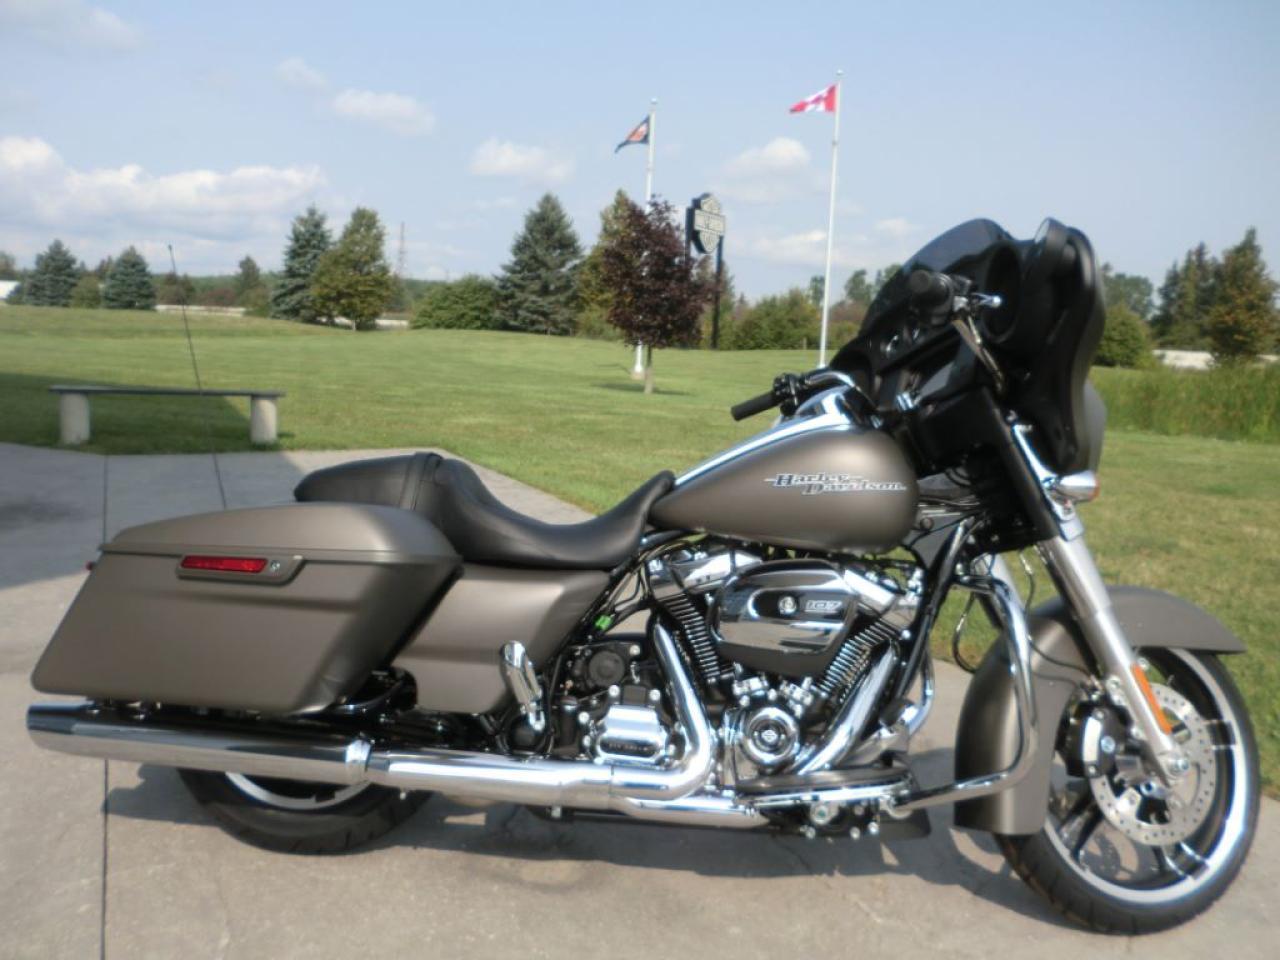 New 2018 Harley-Davidson Street Glide FLHX STREET GLIDE for Sale in Blenheim, Ontario | Carpages.ca